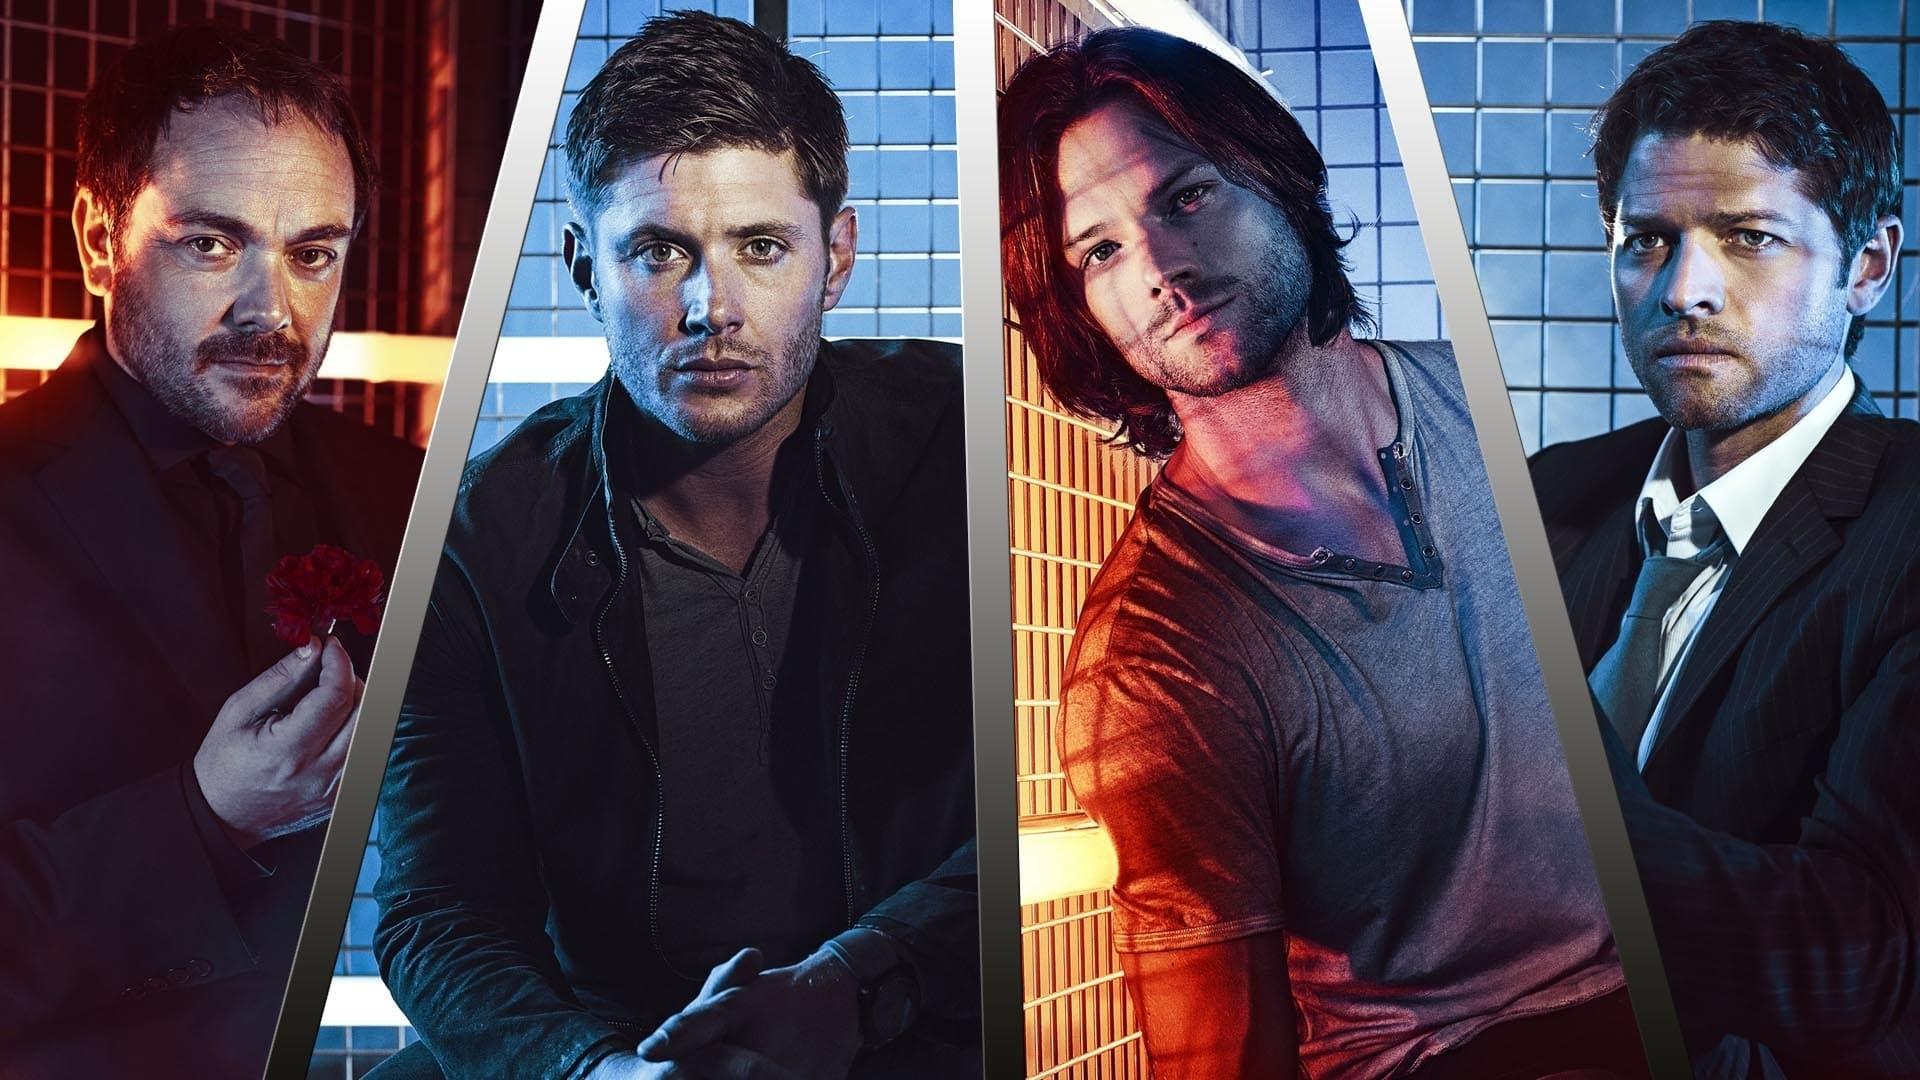 Supernatural - Season 1 Episode 2 Wendigo